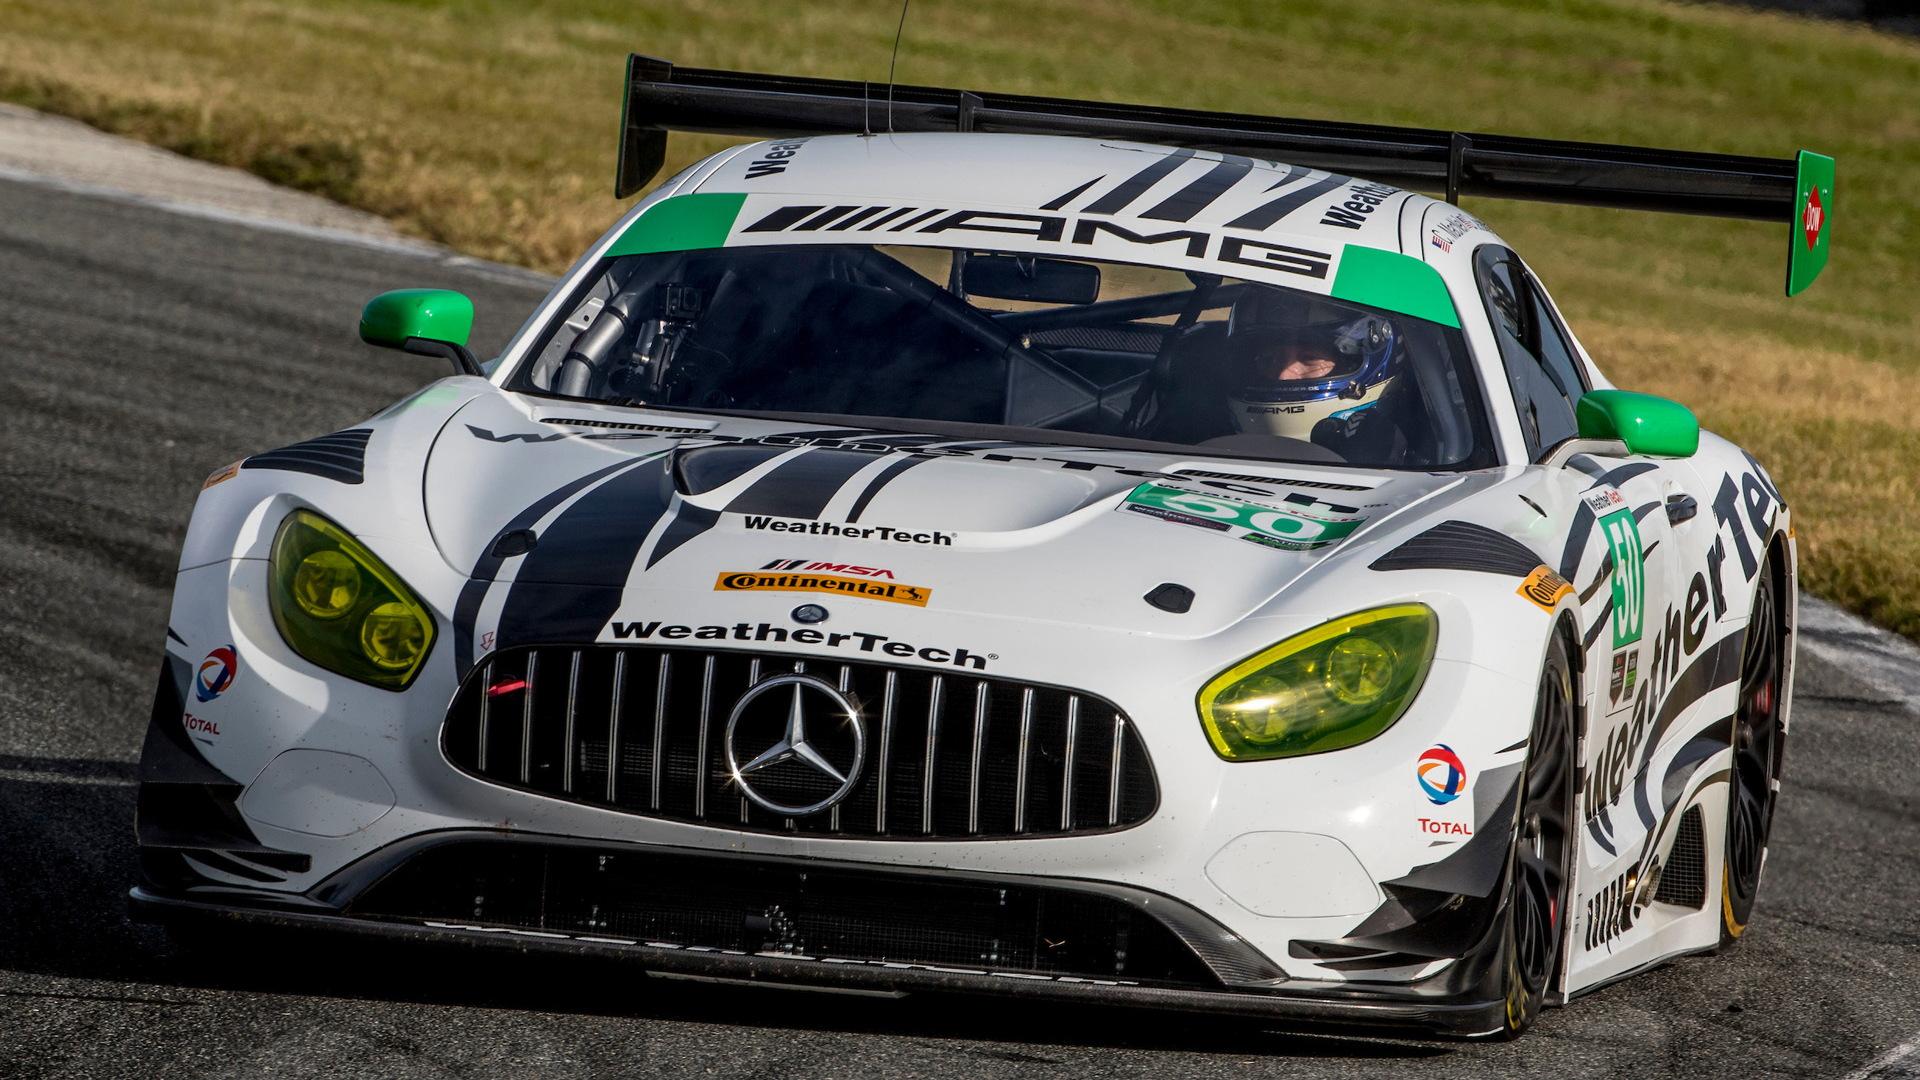 2017 Mercedes-AMG GT3 - Image via Brian Cleary/BCPix.com